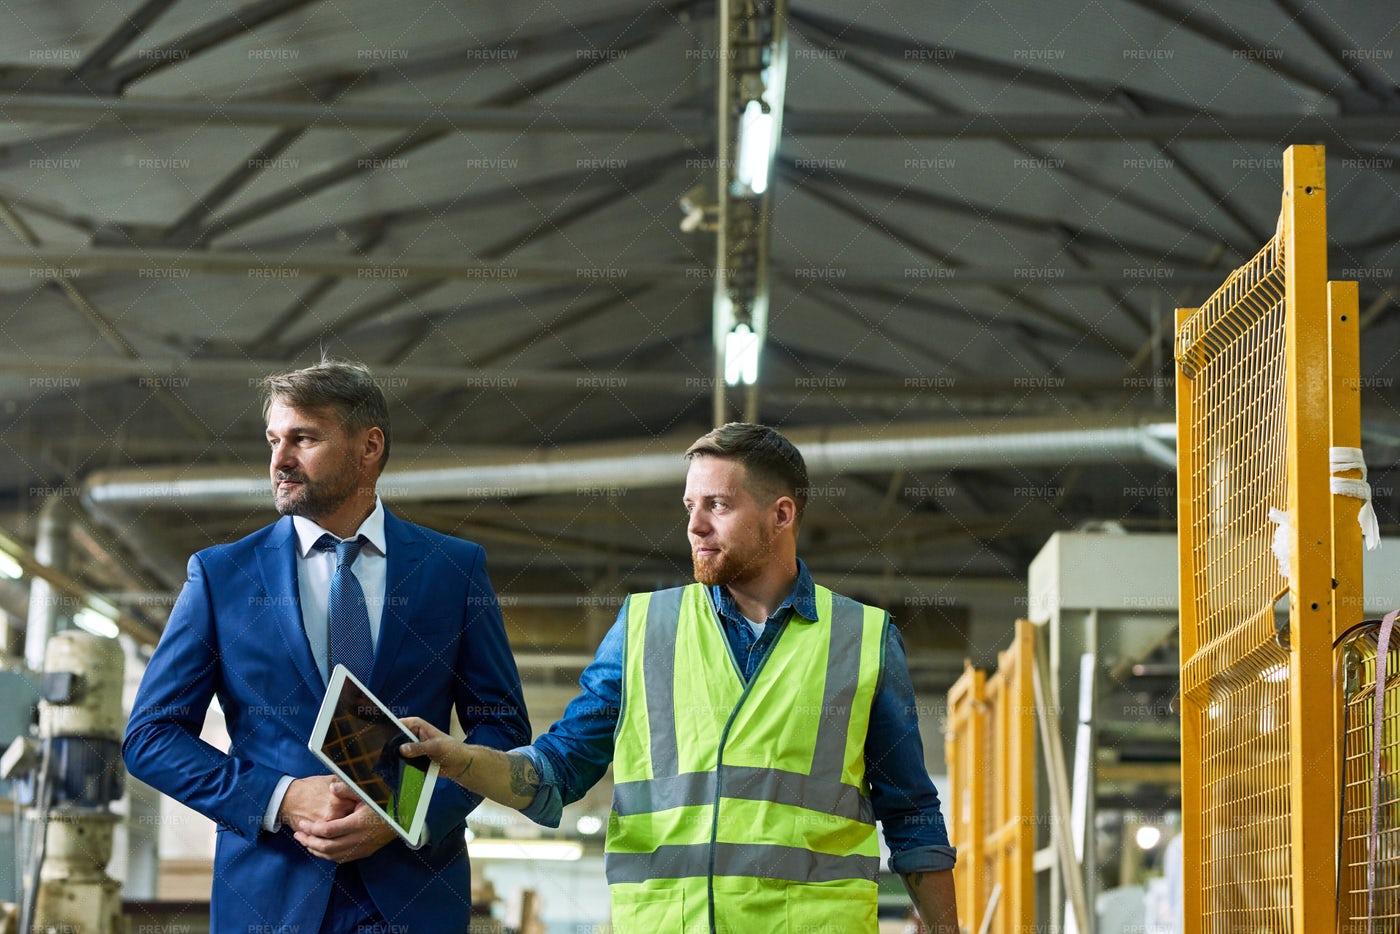 Investor Inspecting Modern Factory: Stock Photos